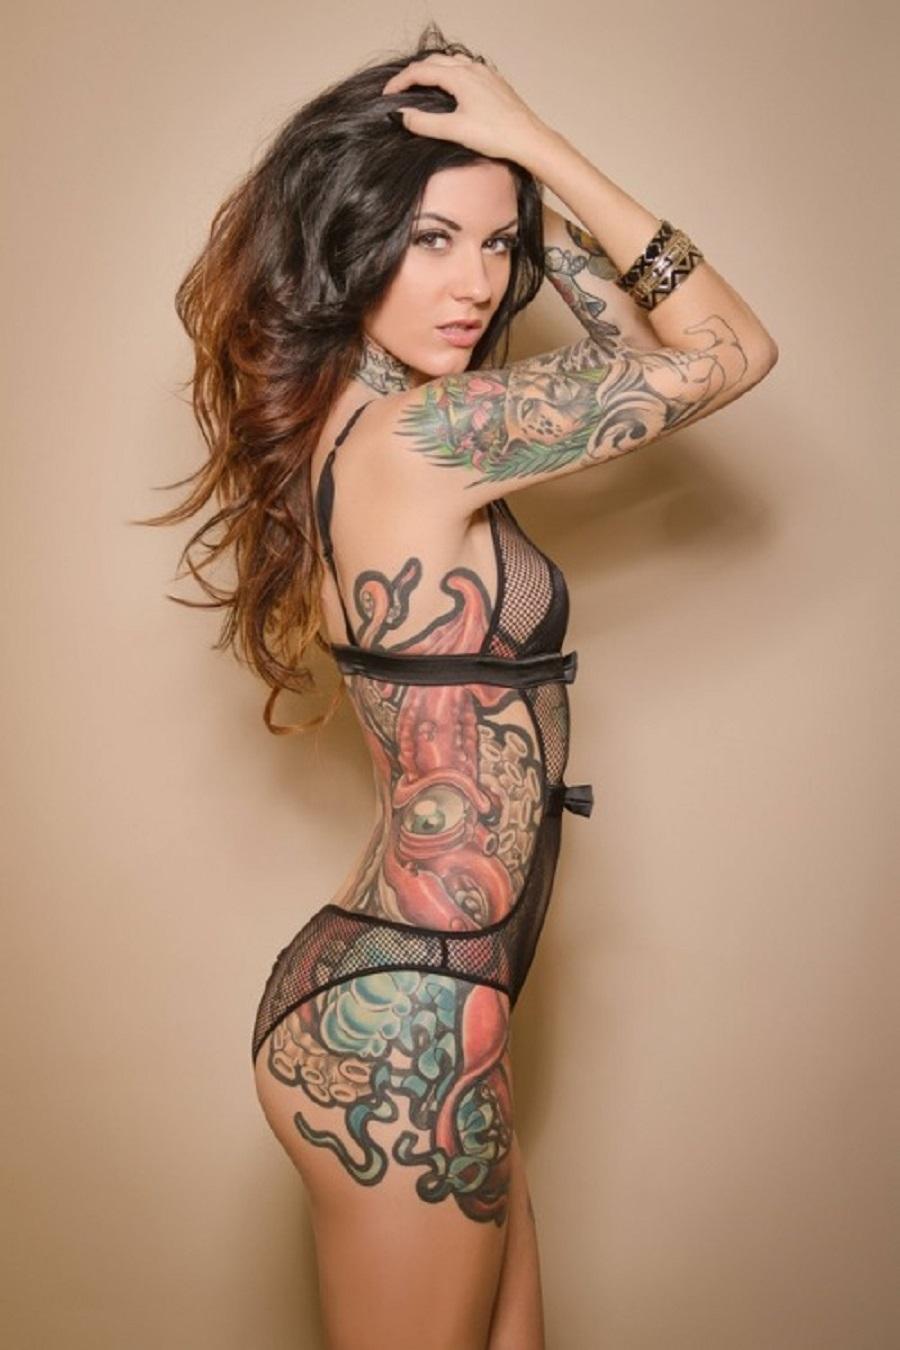 Fine Latina babe with tattoos Sydnee Taylor cockers her intimate flesh № 66501  скачать